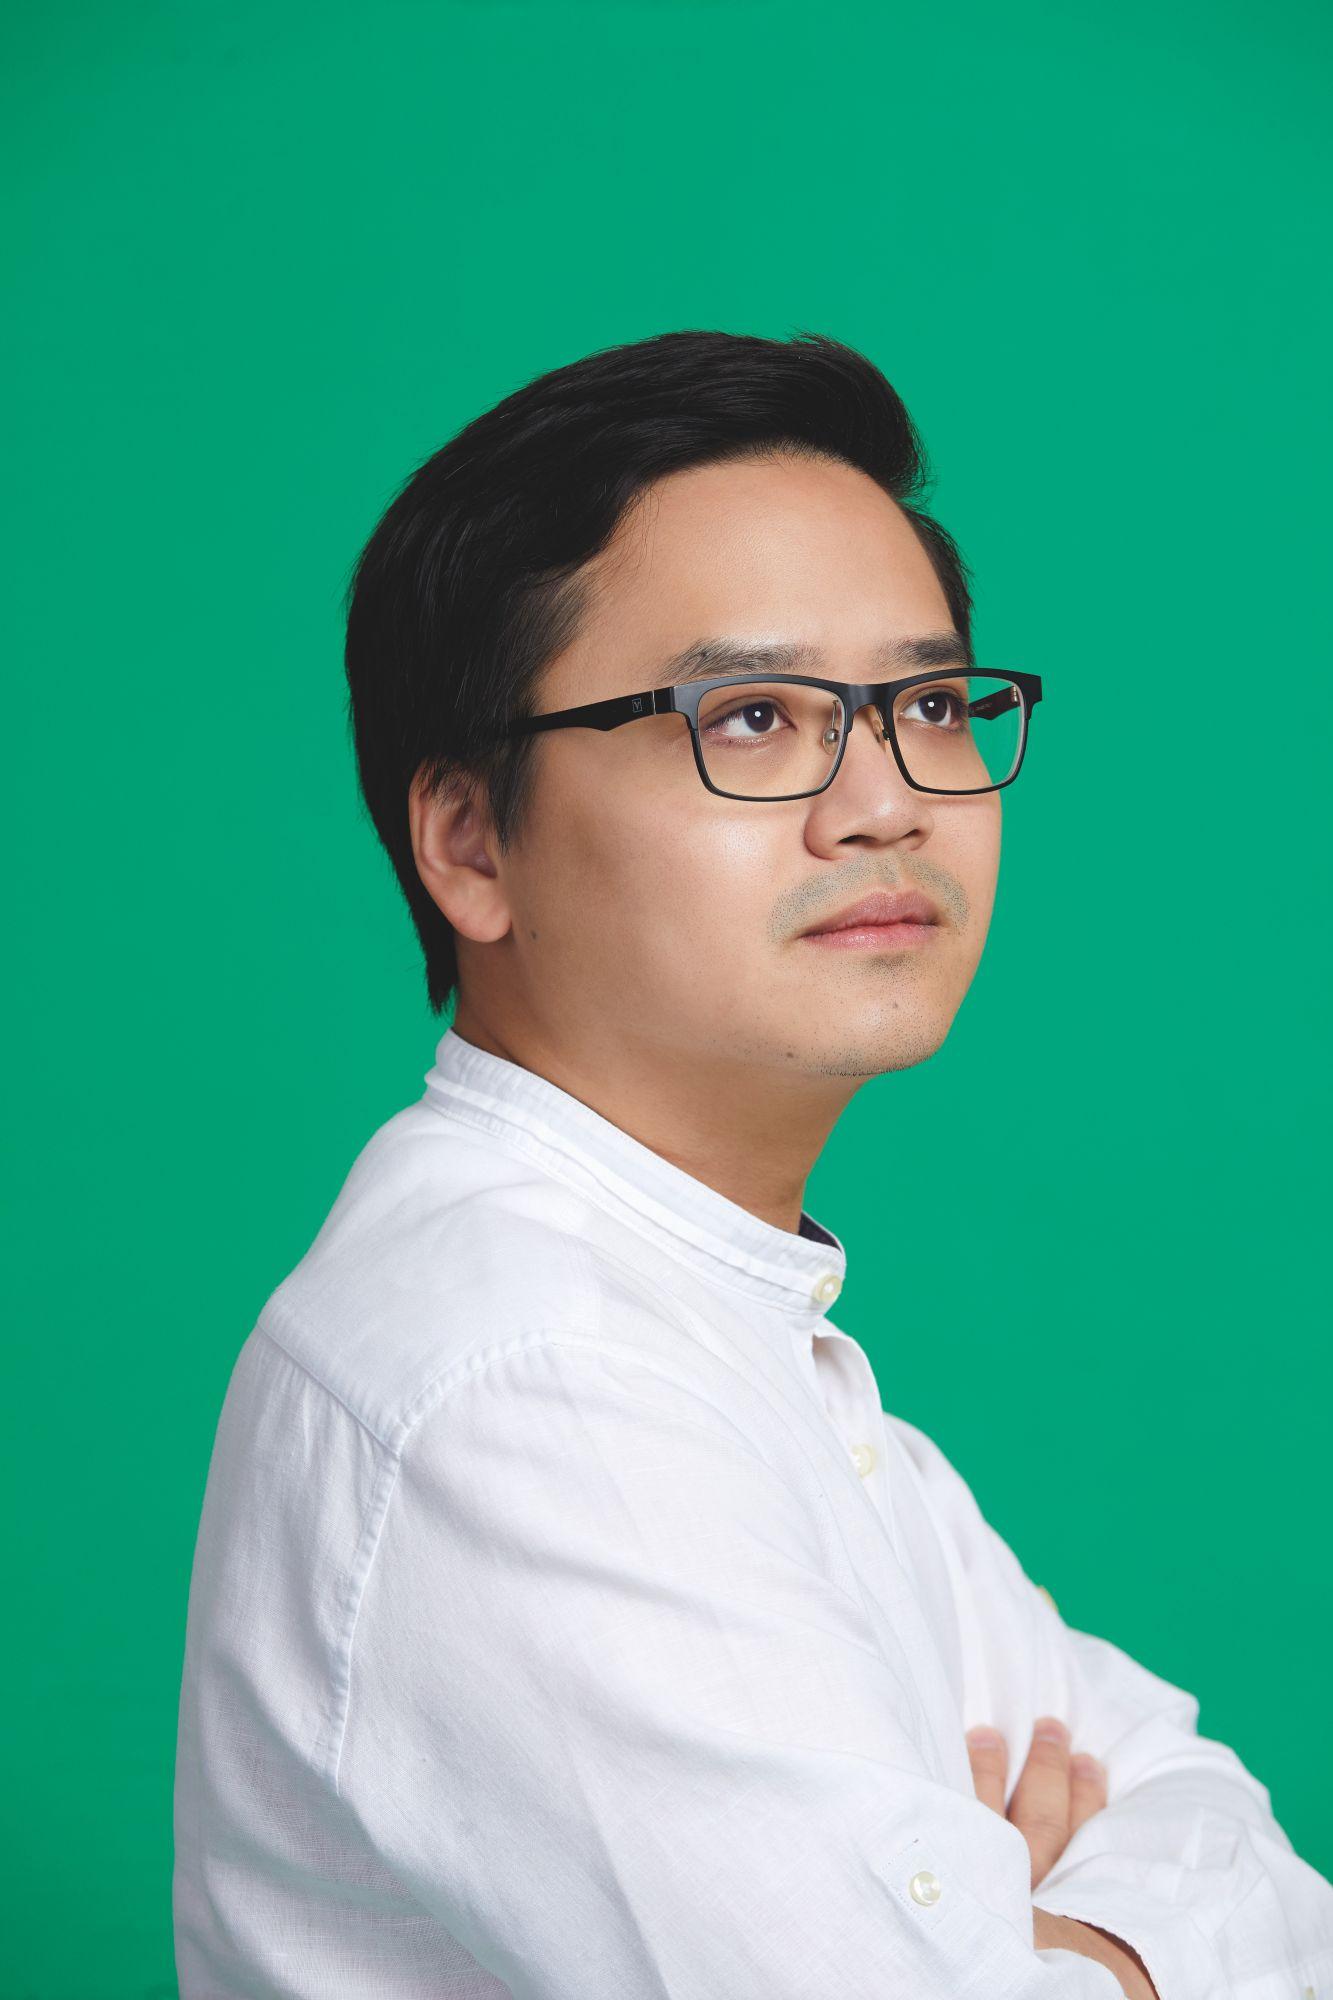 Arch Wongchindawest